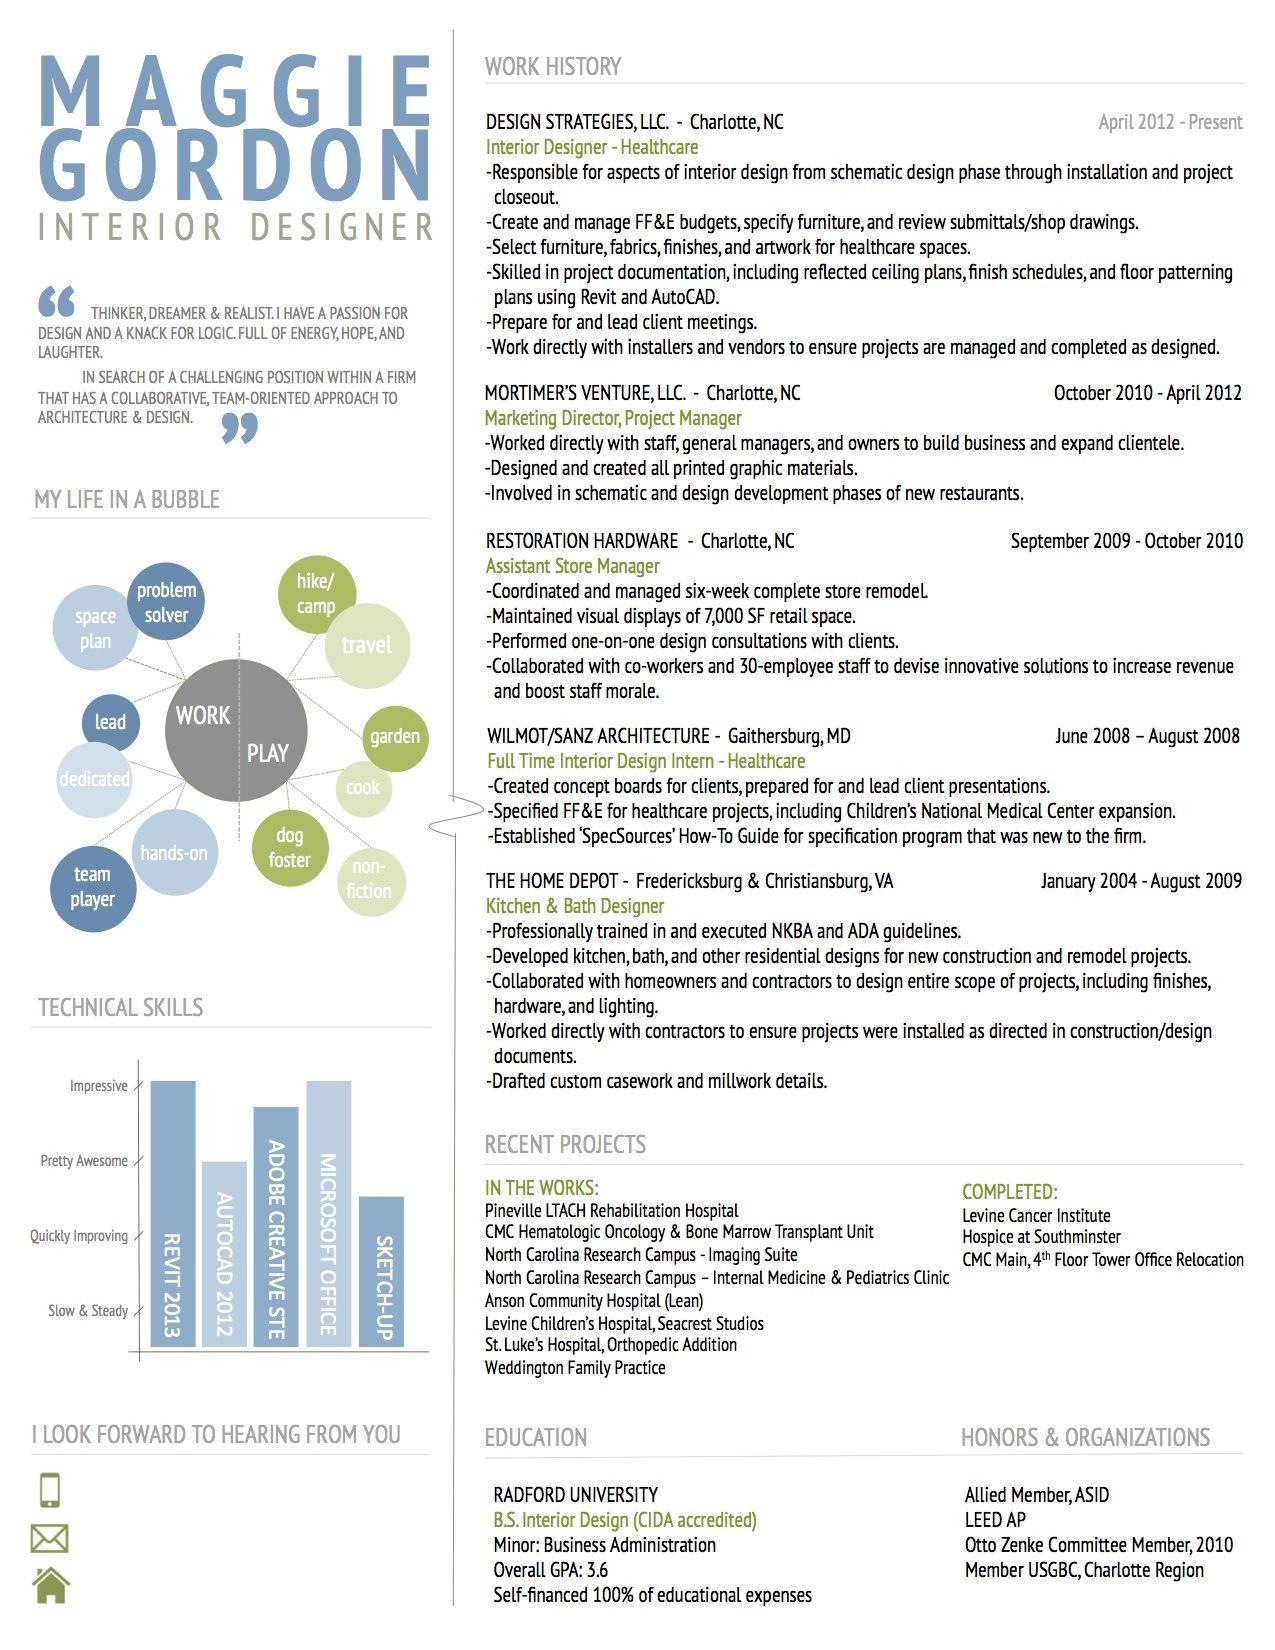 resume format for interior designer le also interior design interior design